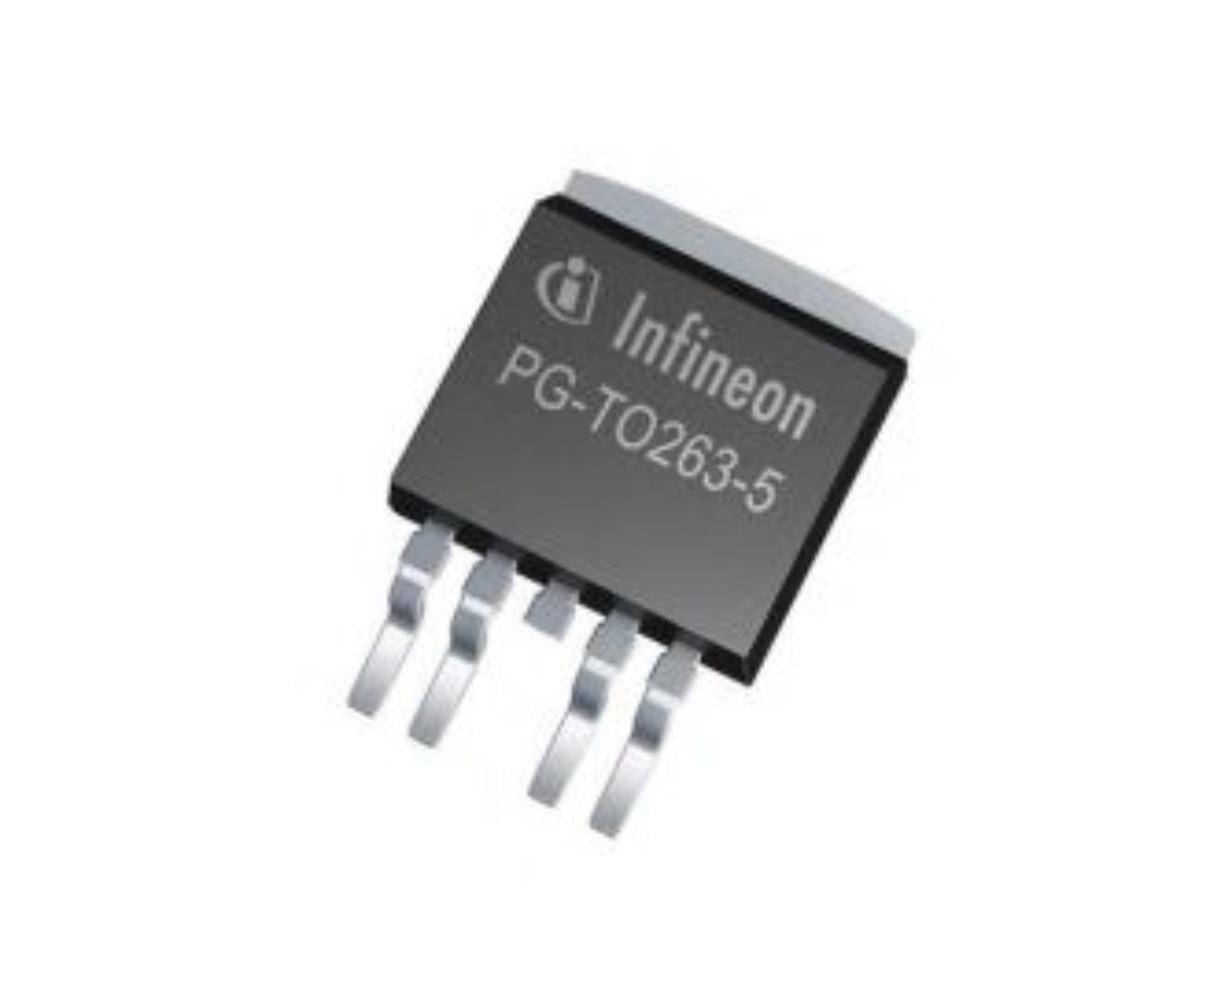 Bts410f2 E3062a Infineon Technologies Circuit Symbols Of Electronic Components 01 00 Pdf 599 Kb